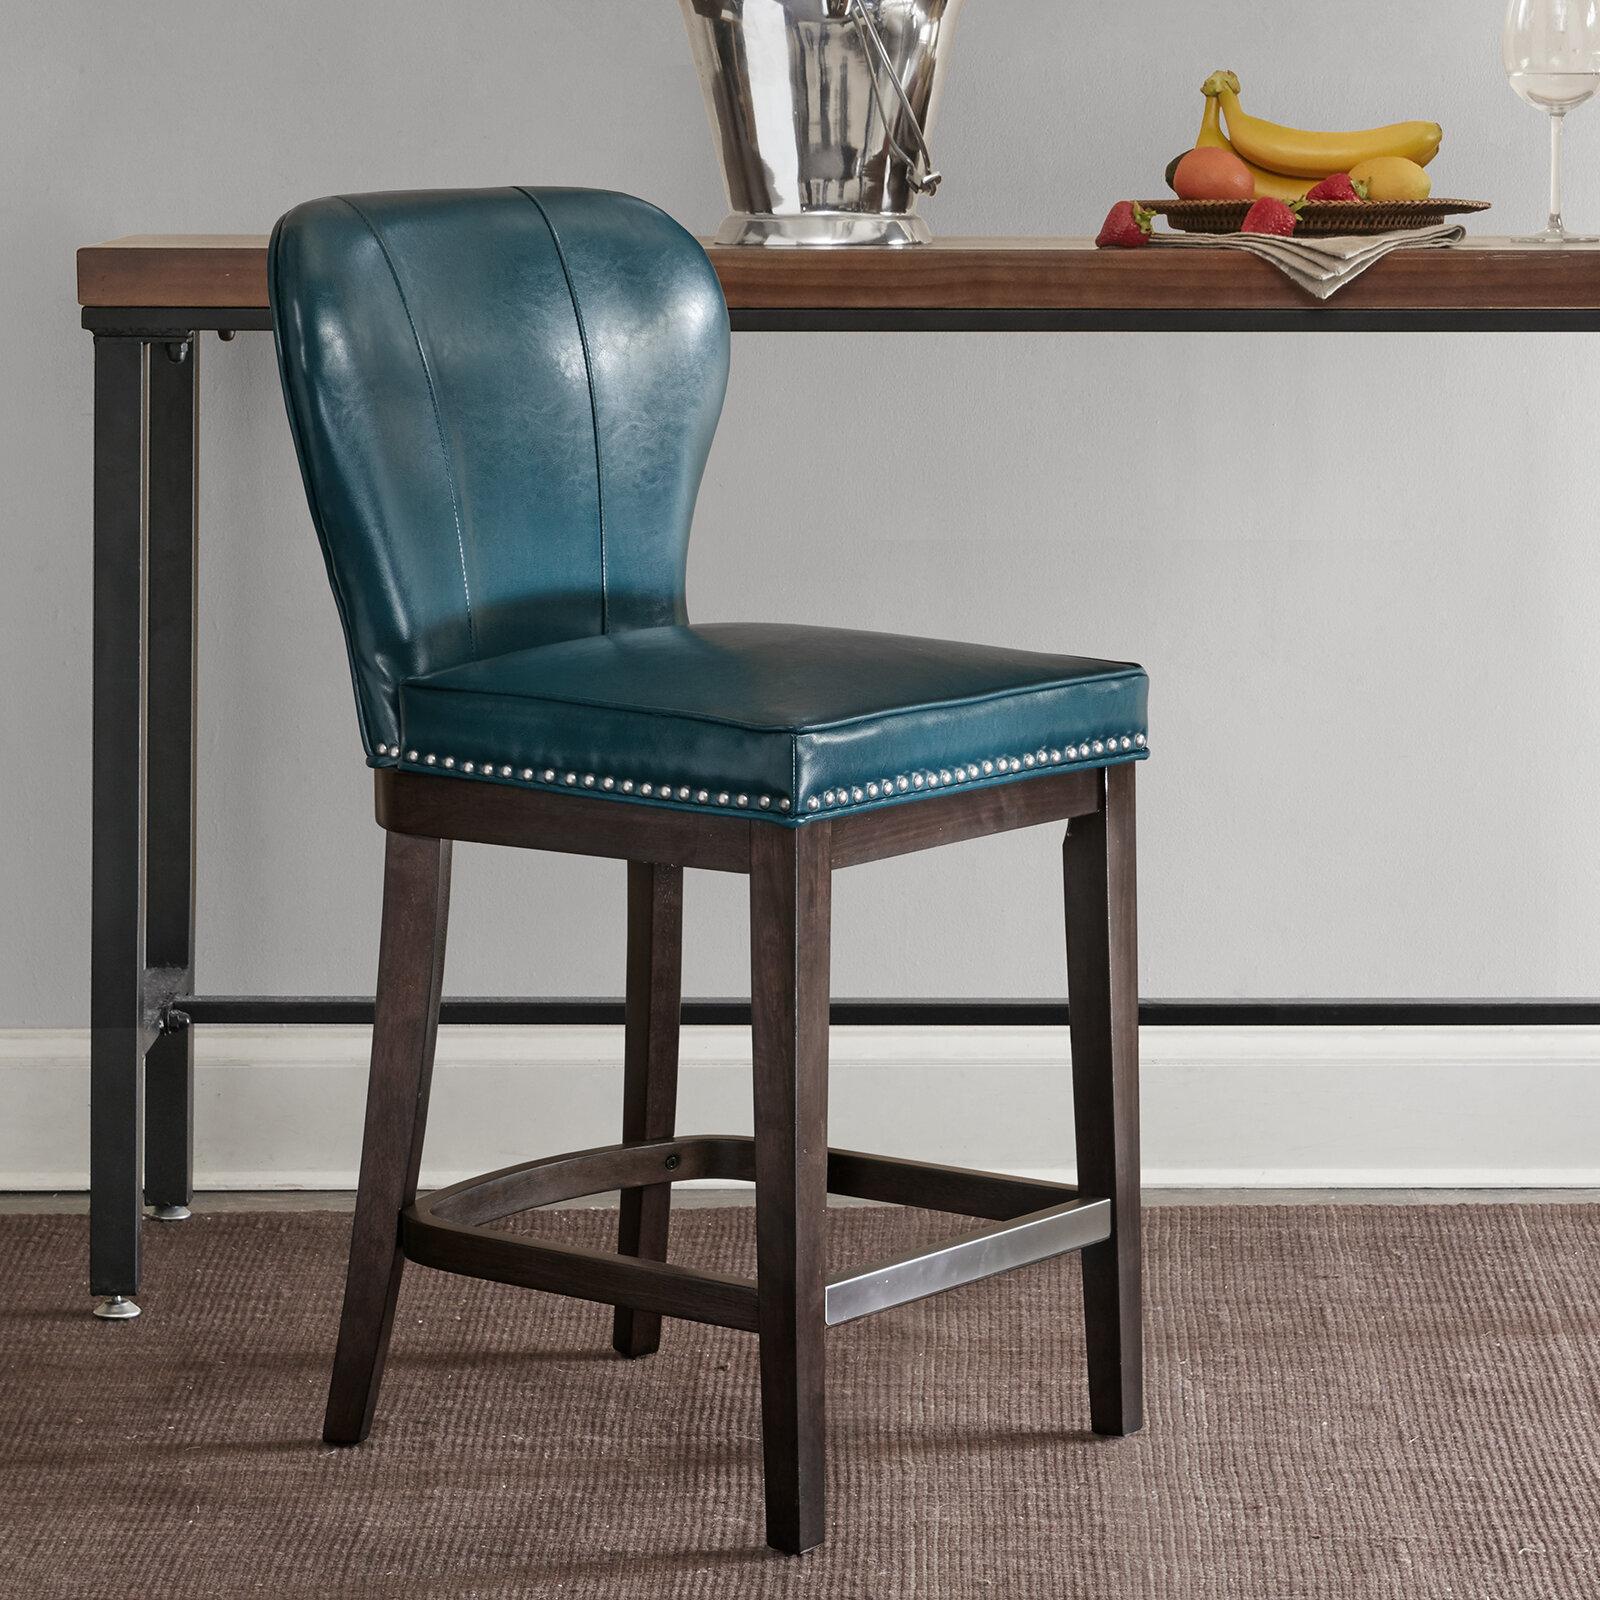 Enjoyable Darby Home Co Zhora 26 Bar Stool Reviews Wayfair Machost Co Dining Chair Design Ideas Machostcouk